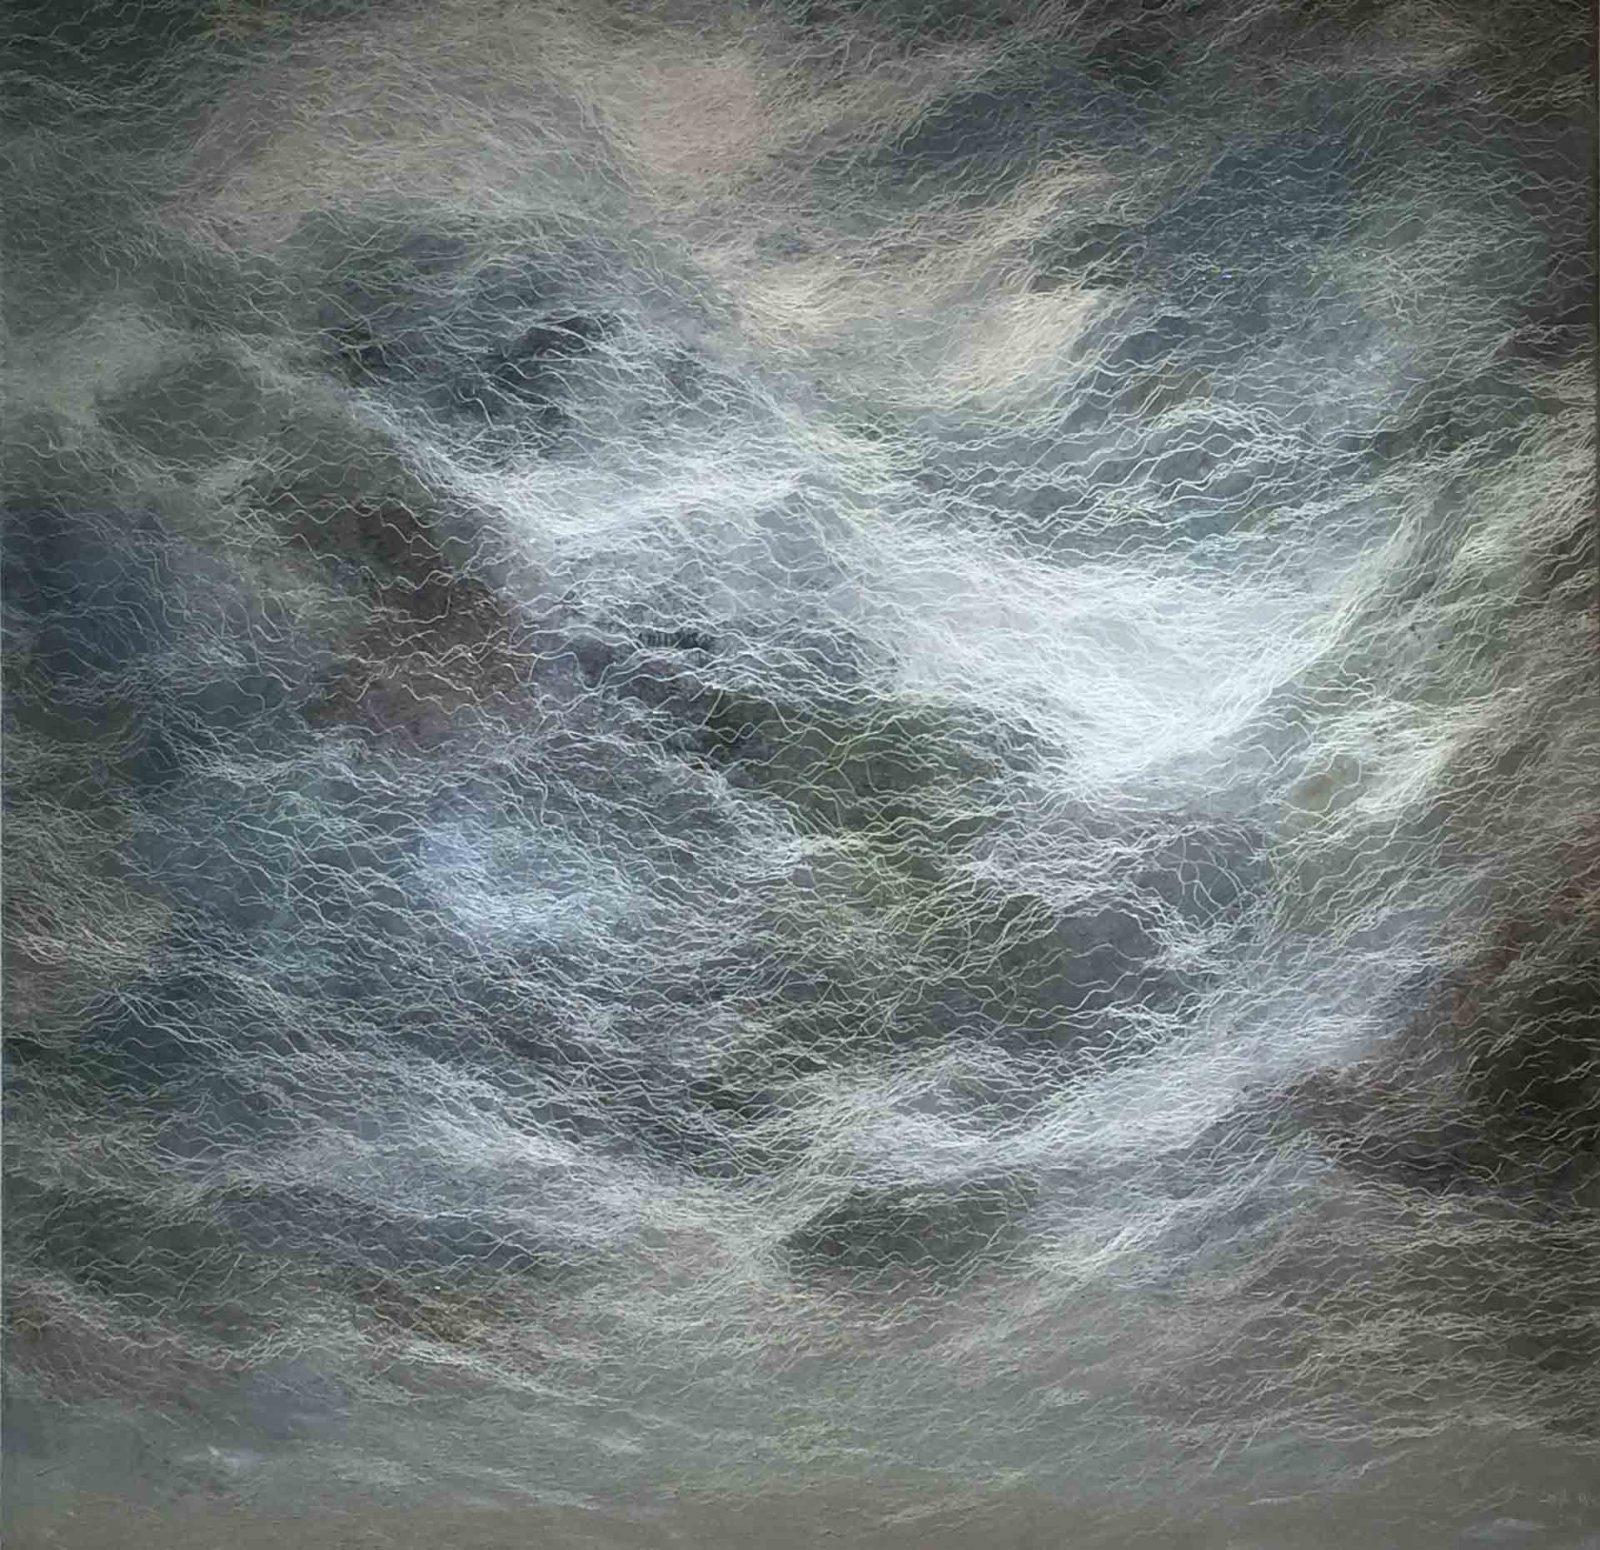 Odyssey III, 52 x 52, oil on canvas, 2016